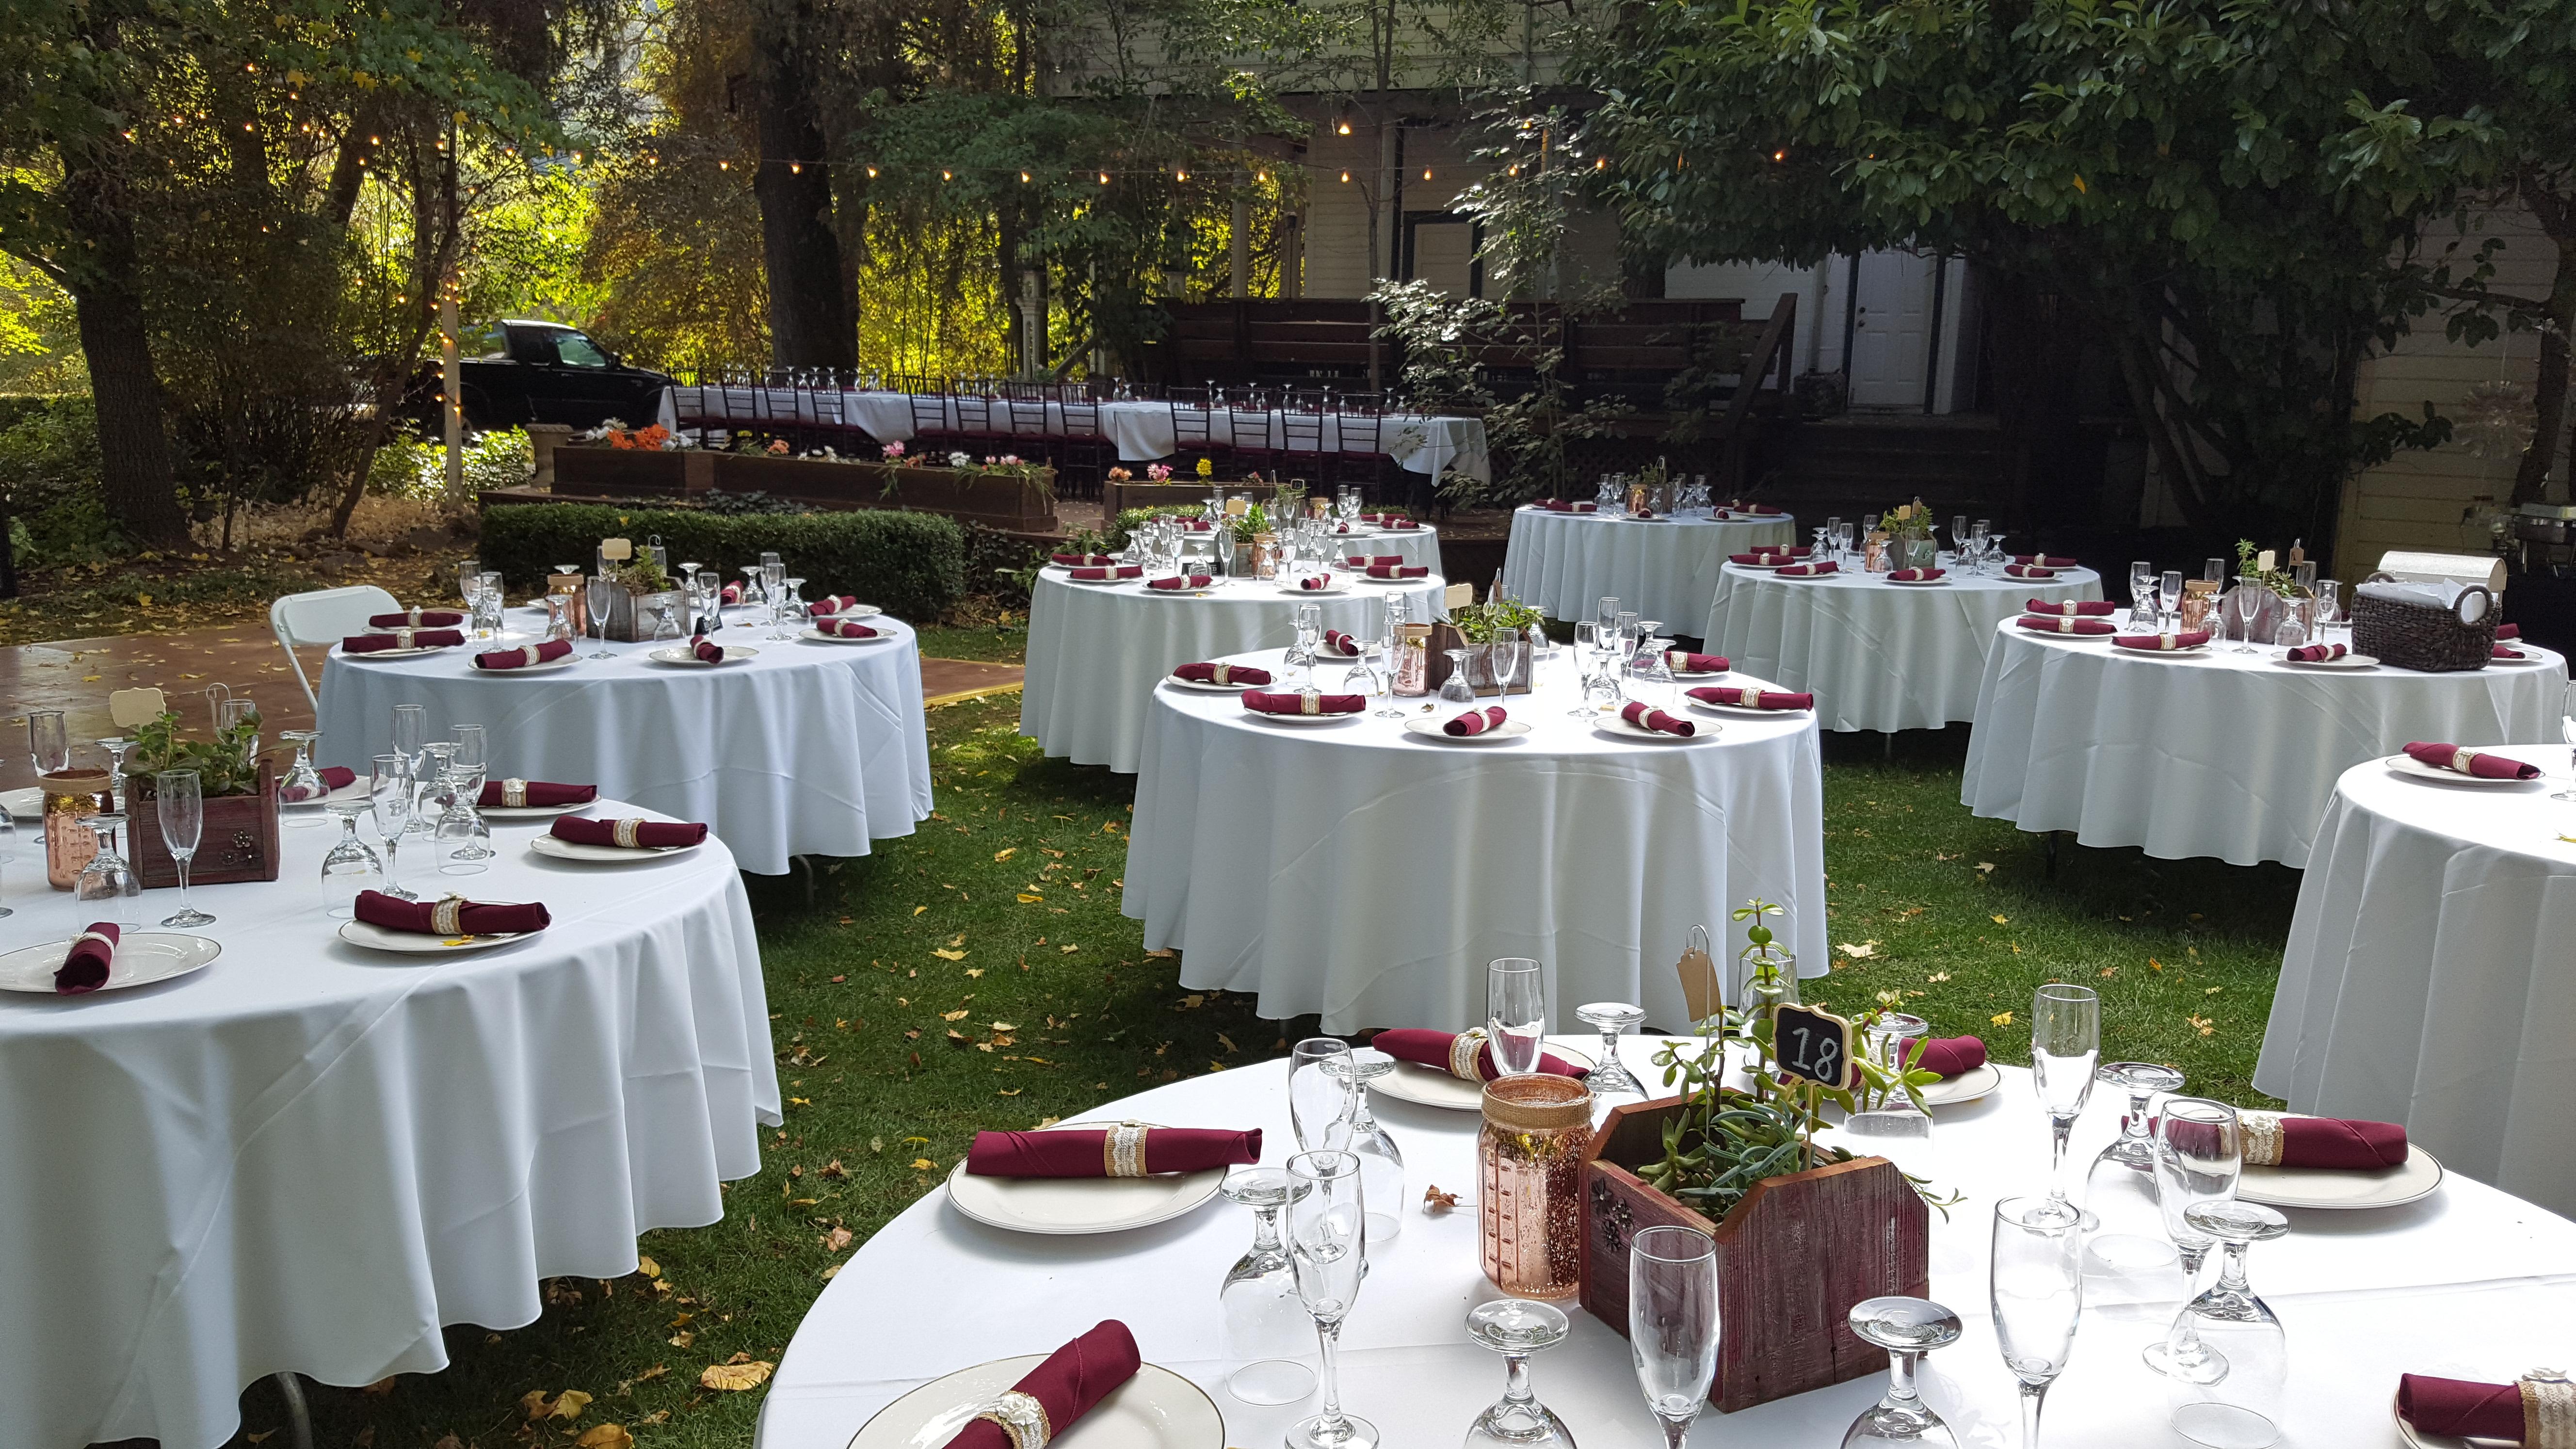 Wedding Tables In the Garden